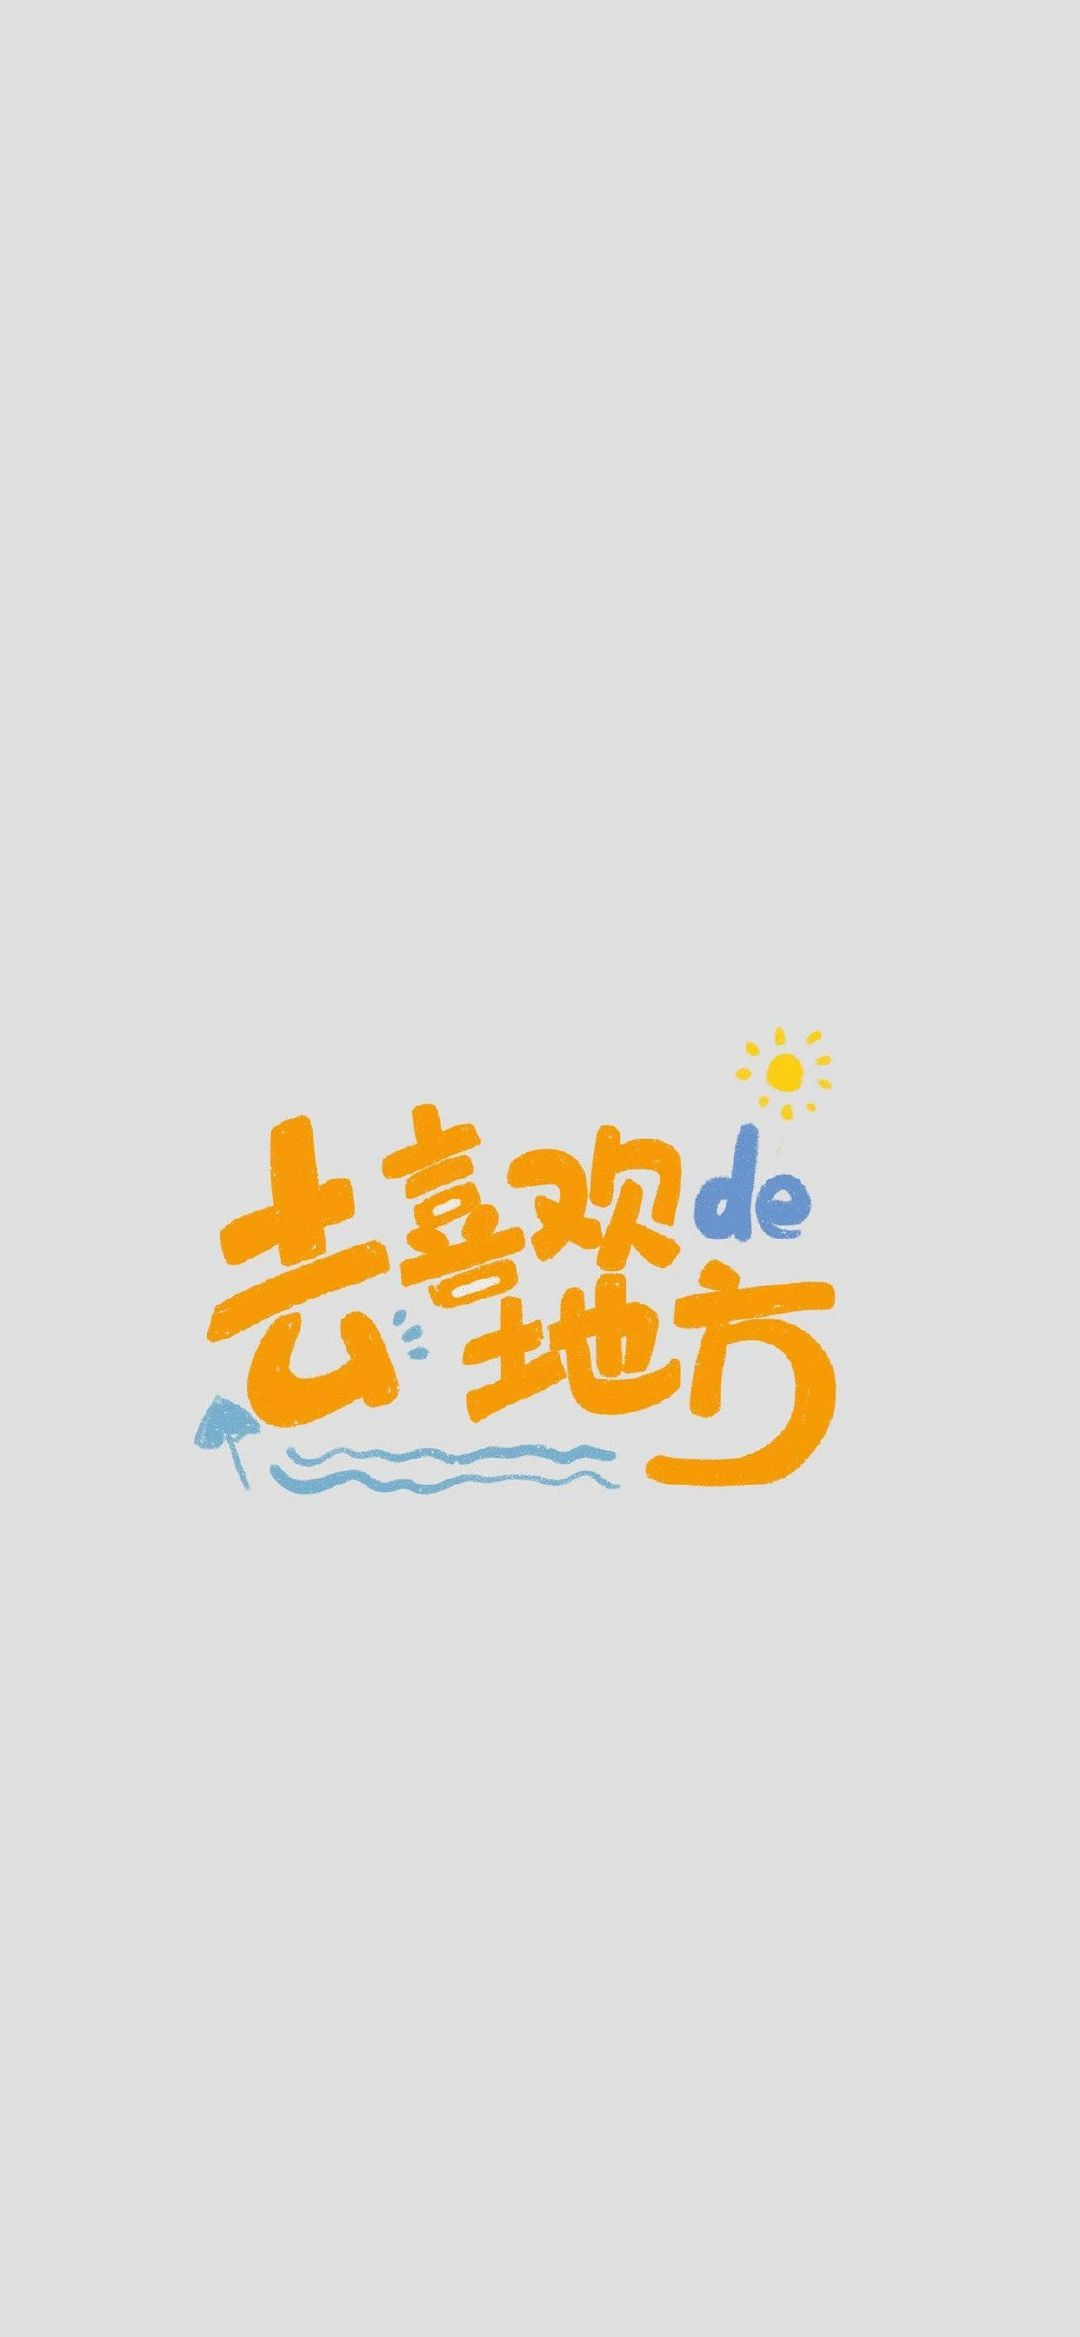 5e5d47a383bce - 精选壁纸:正能量 小清新 文字!